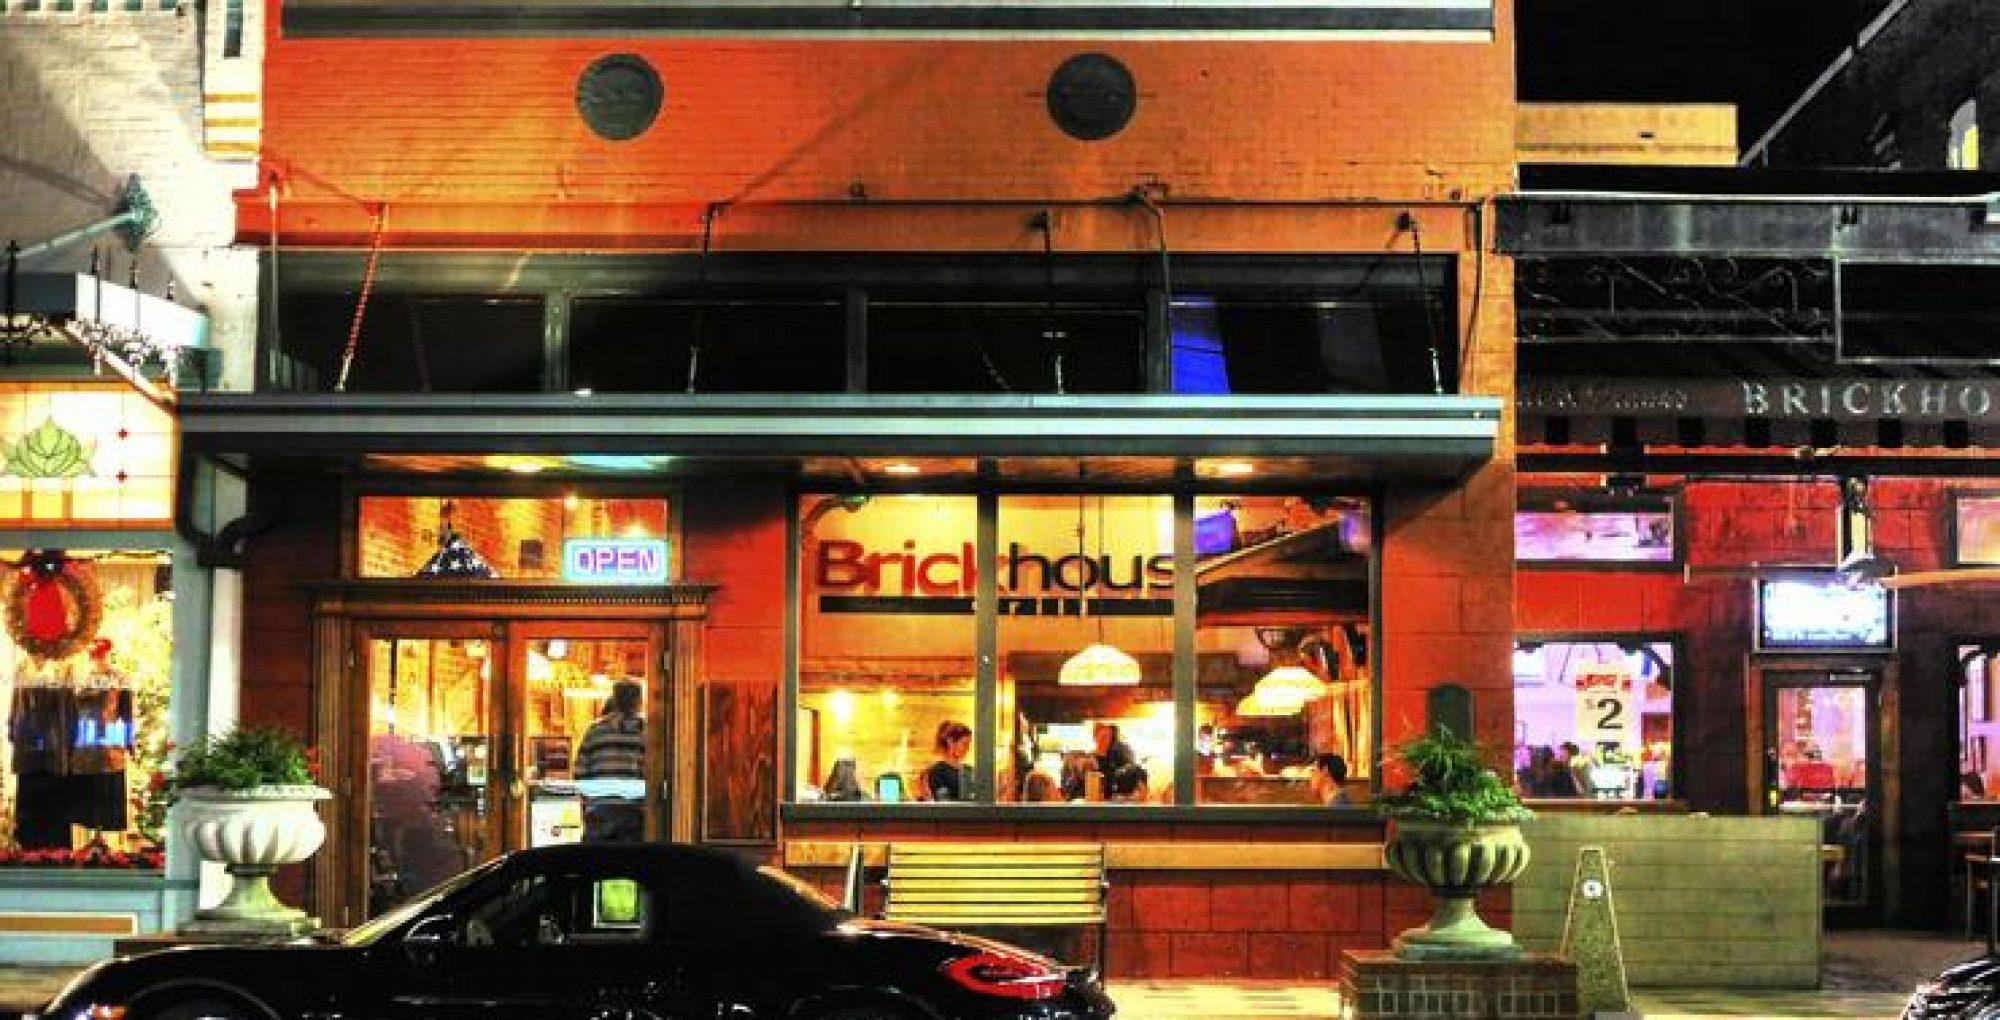 BrickHouse Grill